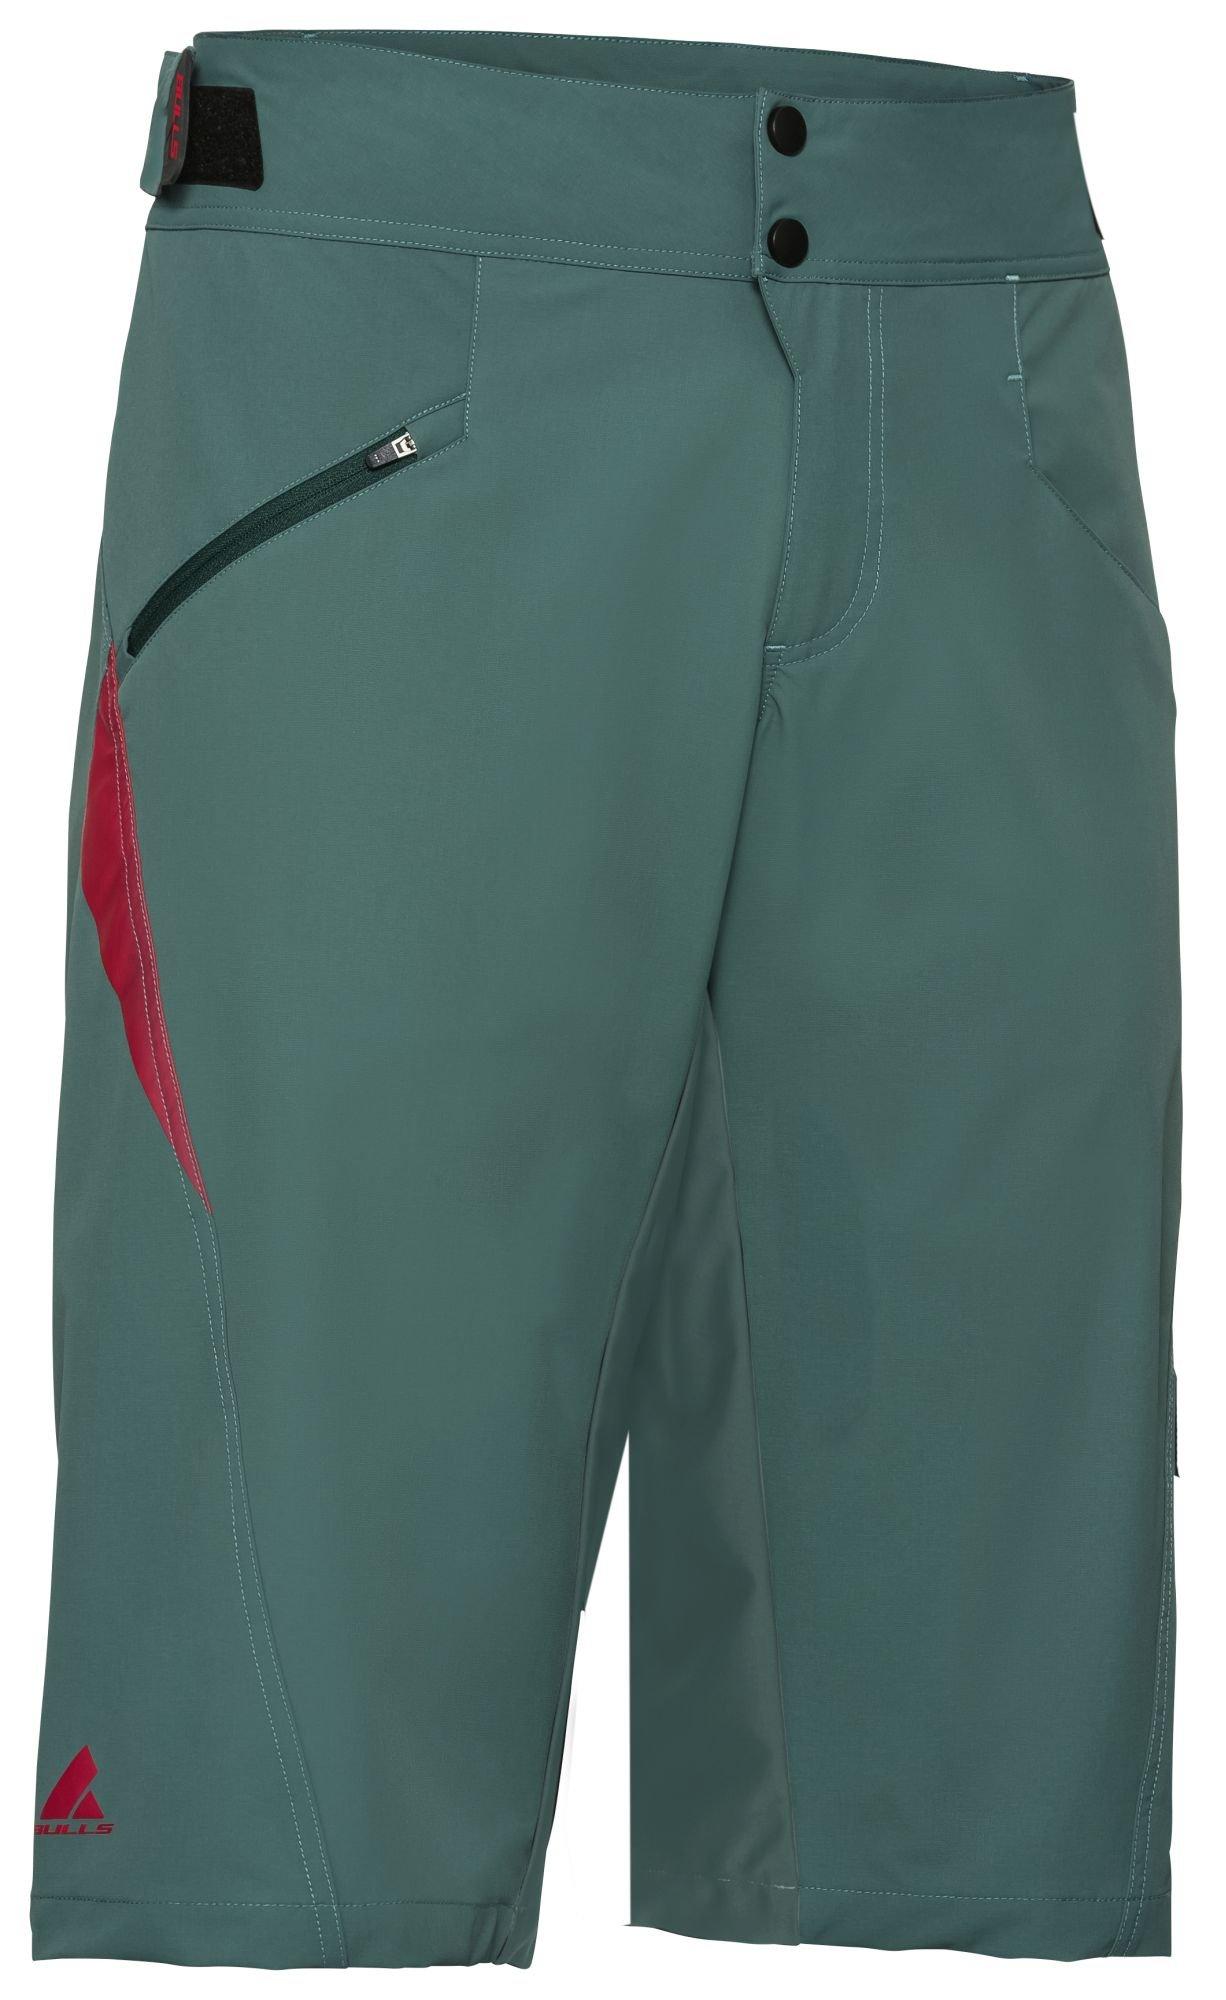 BULLS Herren Shorts Comox M green